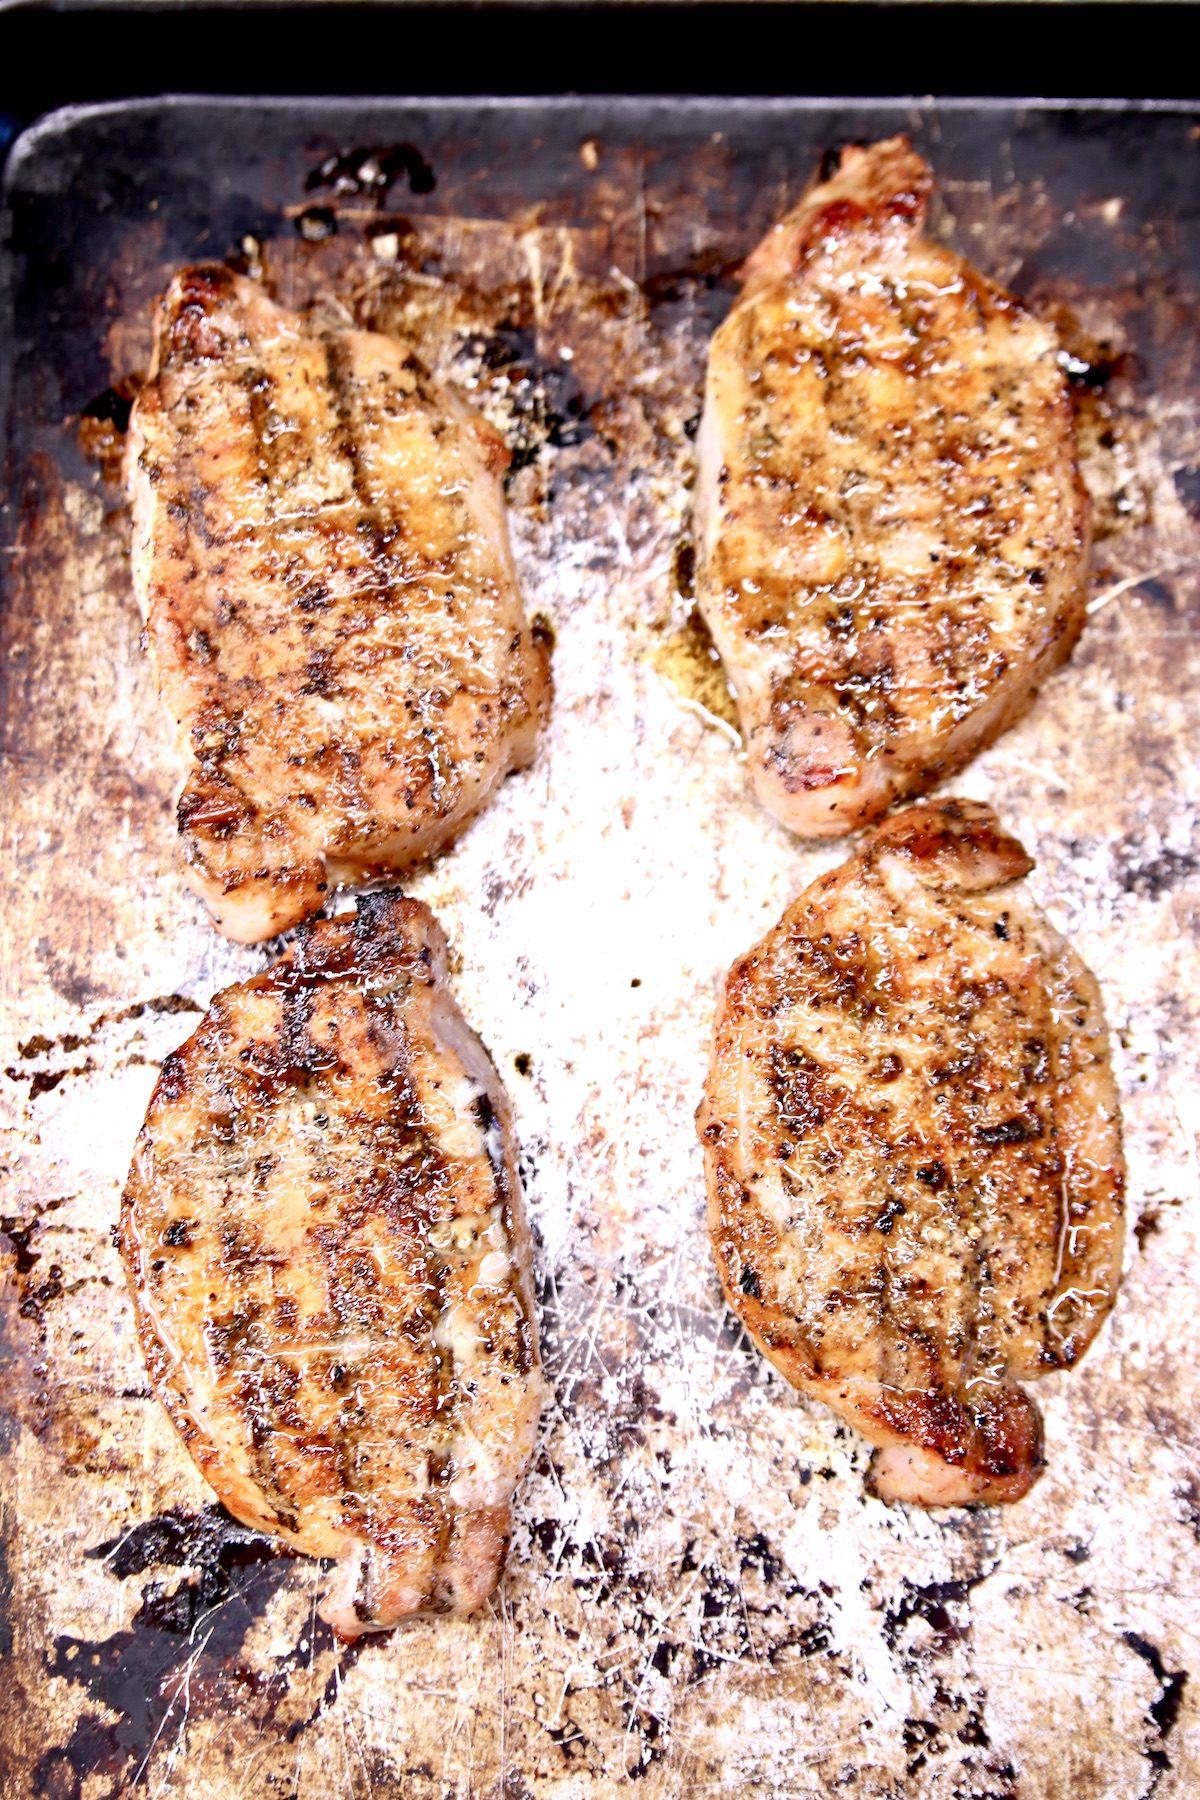 sheet pan with 4 grilled boneless pork chops